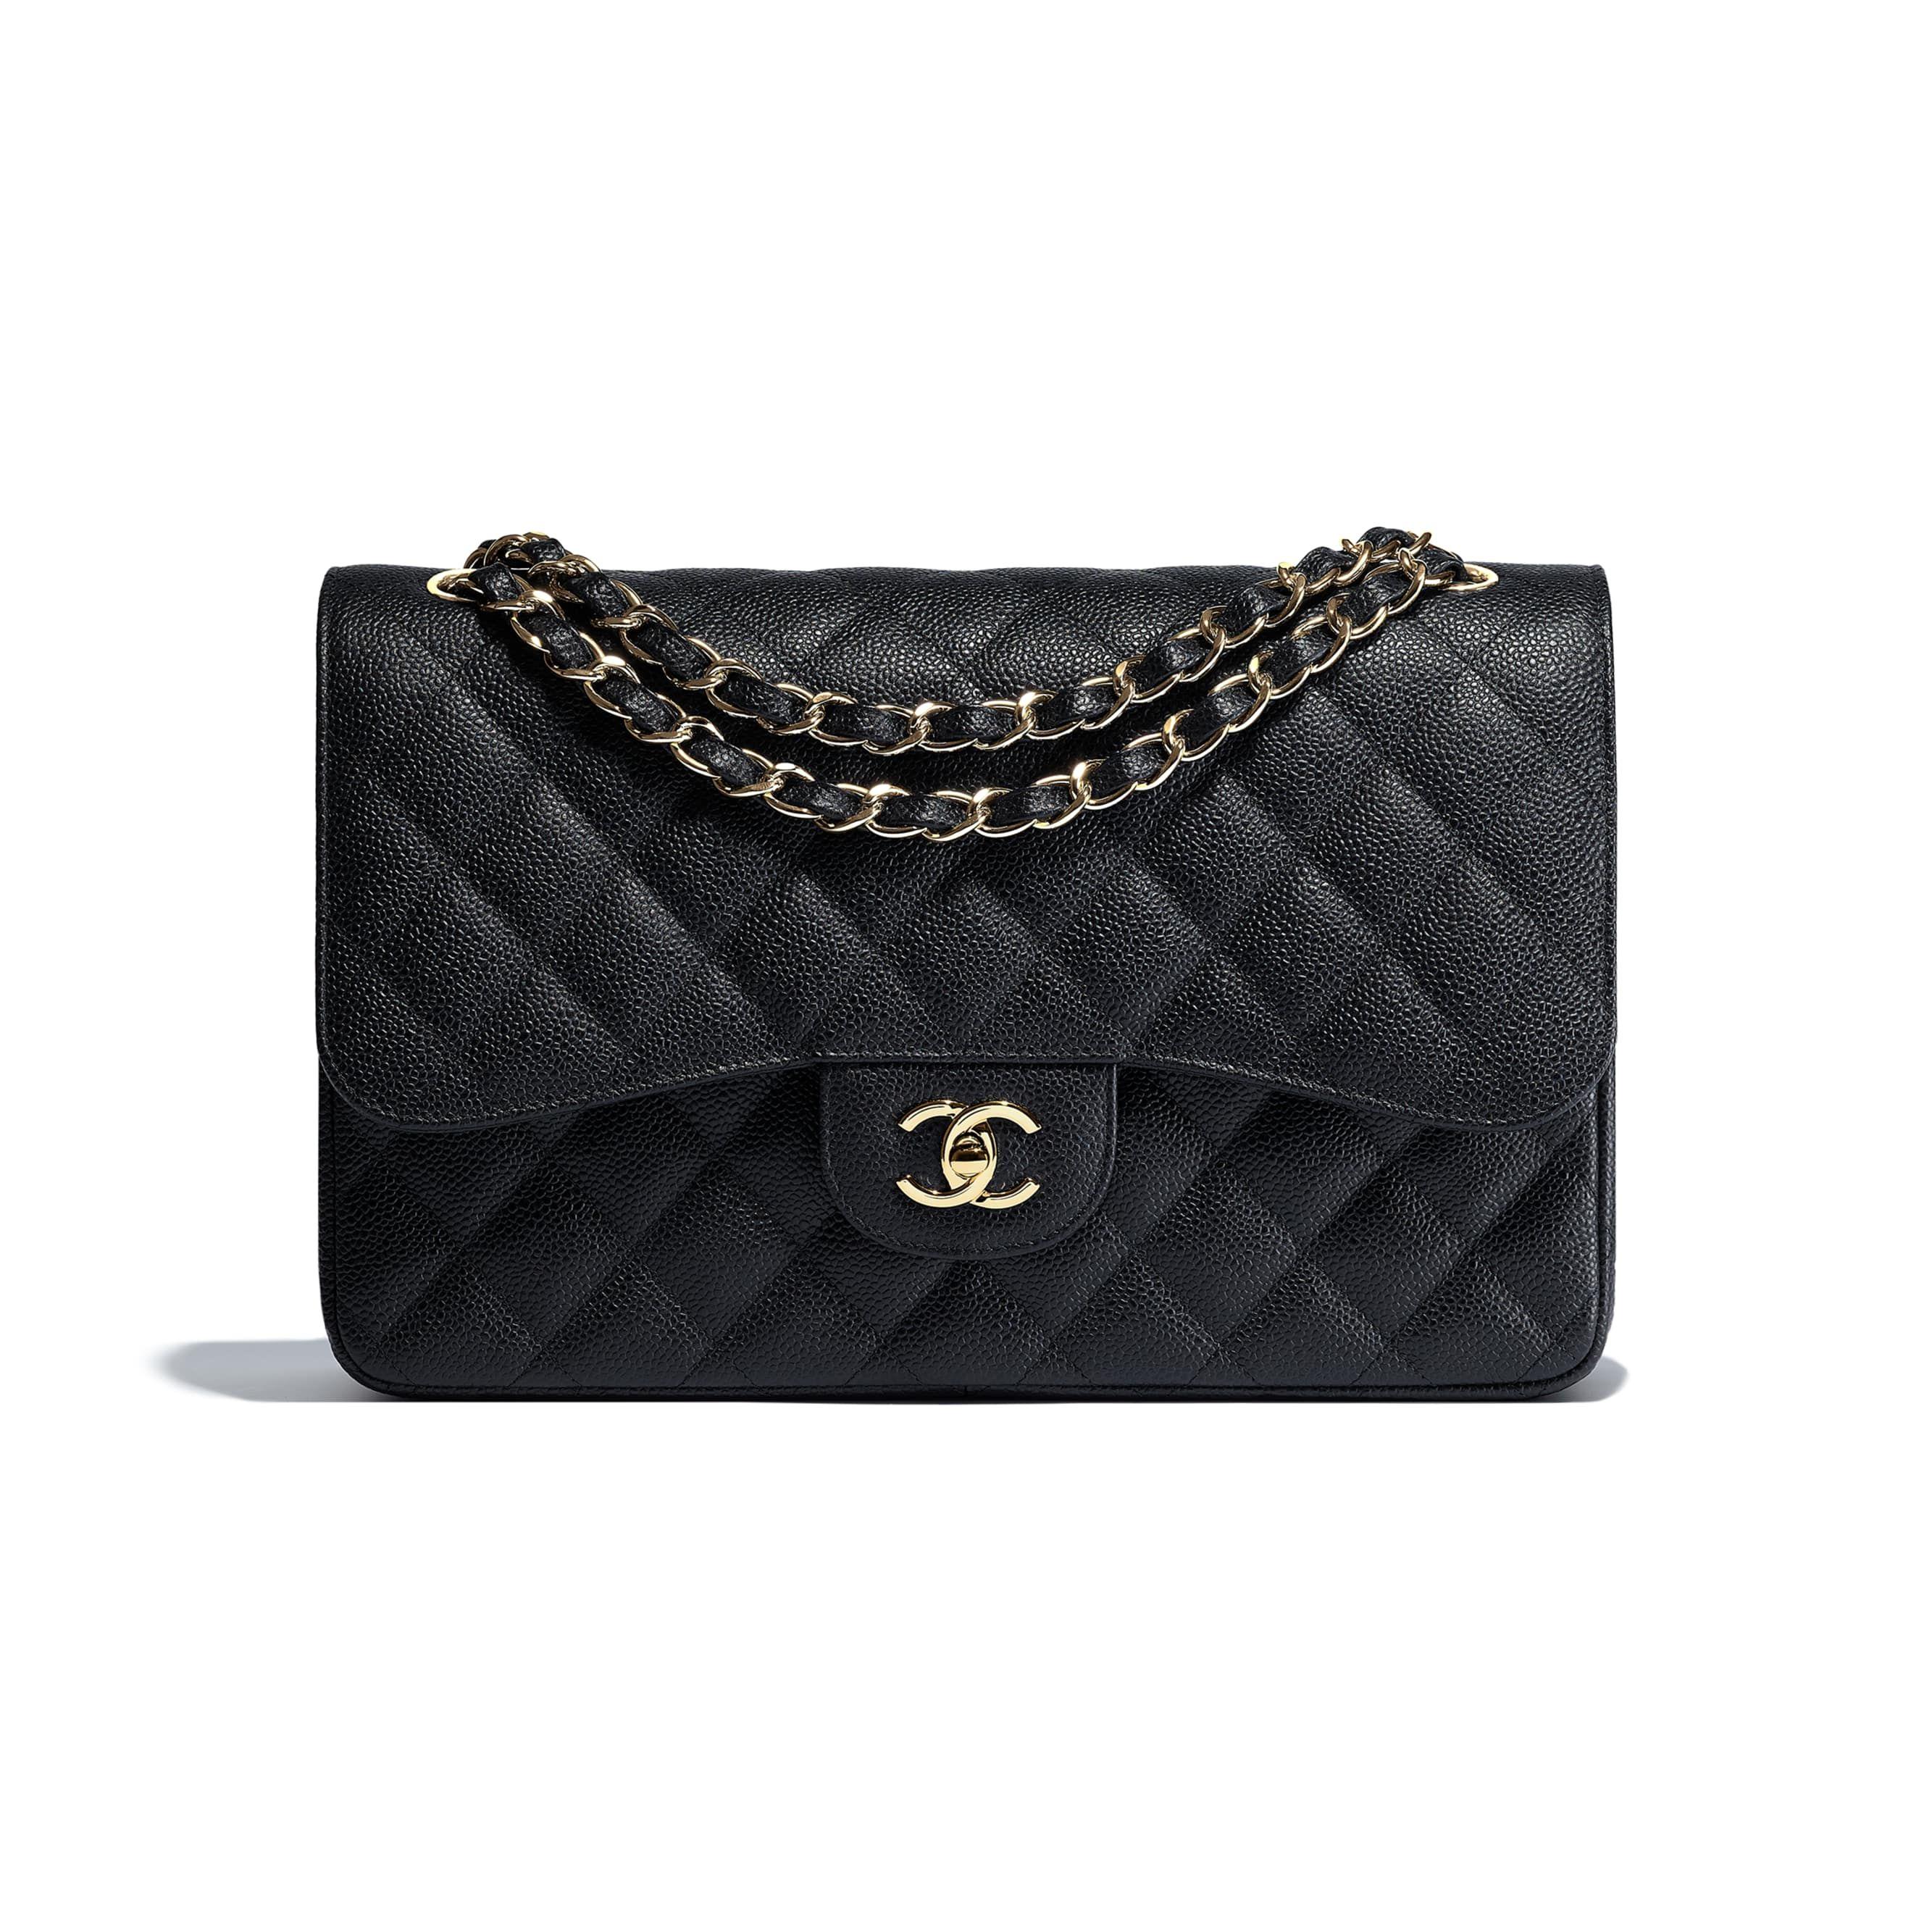 Grained Calfskin Gold Tone Metal Black Large Classic Handbag Chanel Bag Classic Classic Handbags Chanel Bag